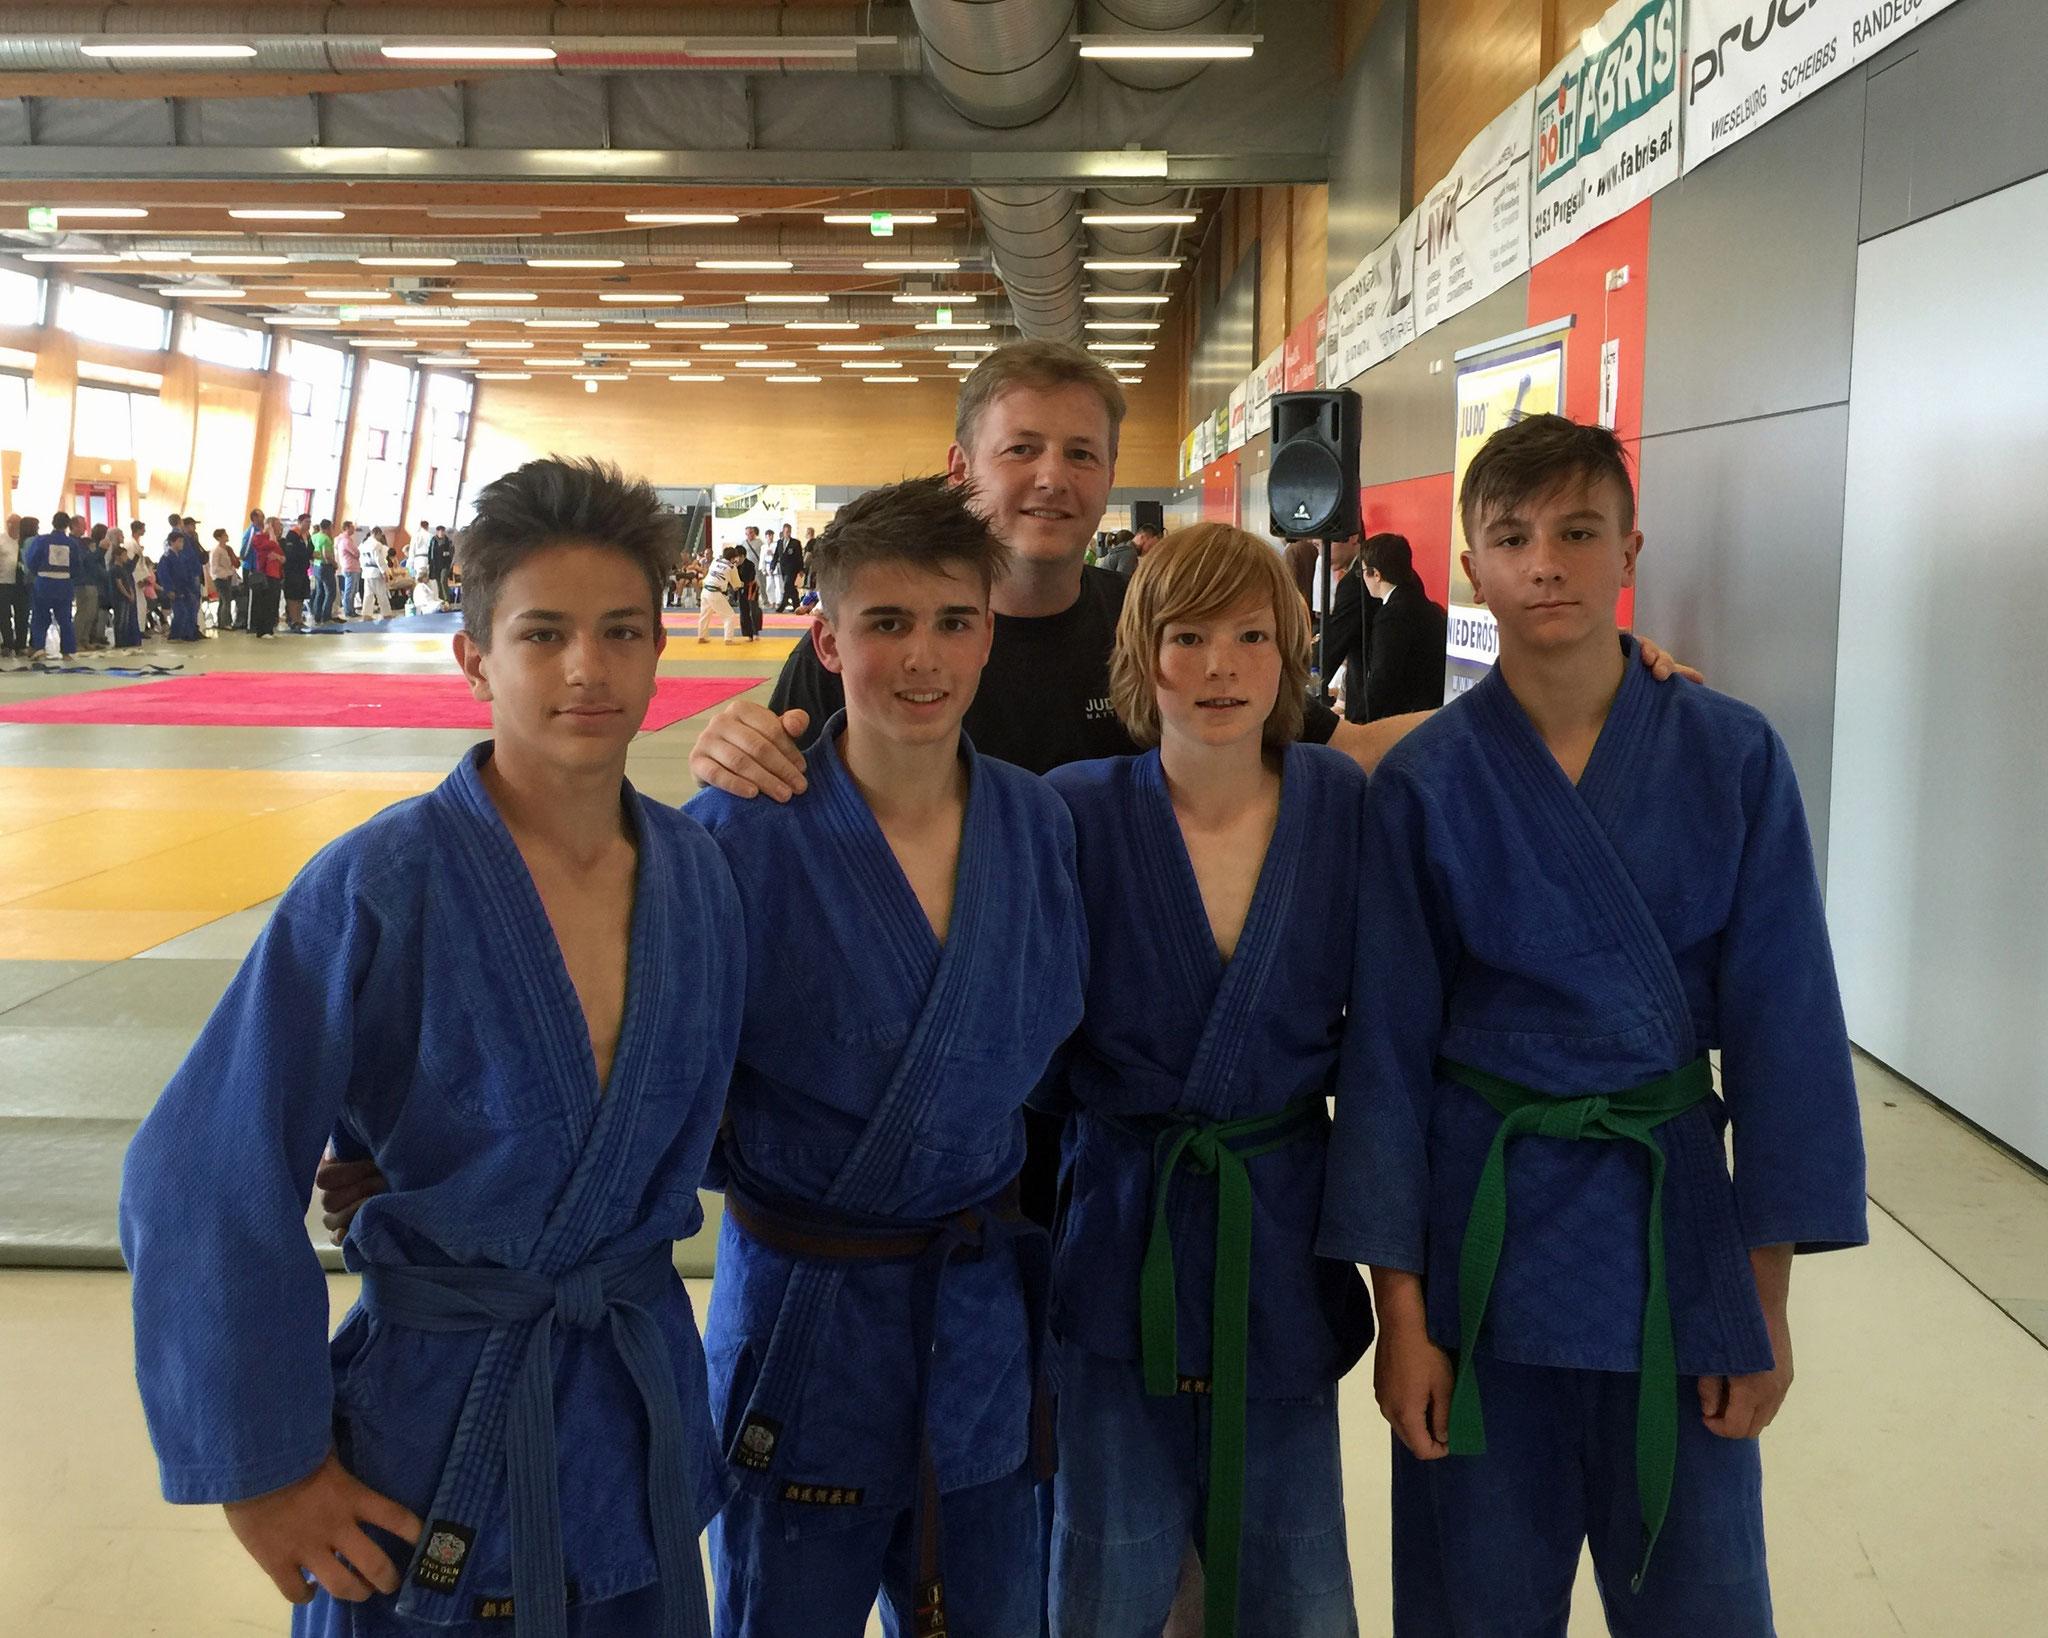 v.l.n.r. Tobias Leyrer,  JulianPrenner, Trainer Thomas Puntigam,  Andreas Puntigam, Julian Riedinger